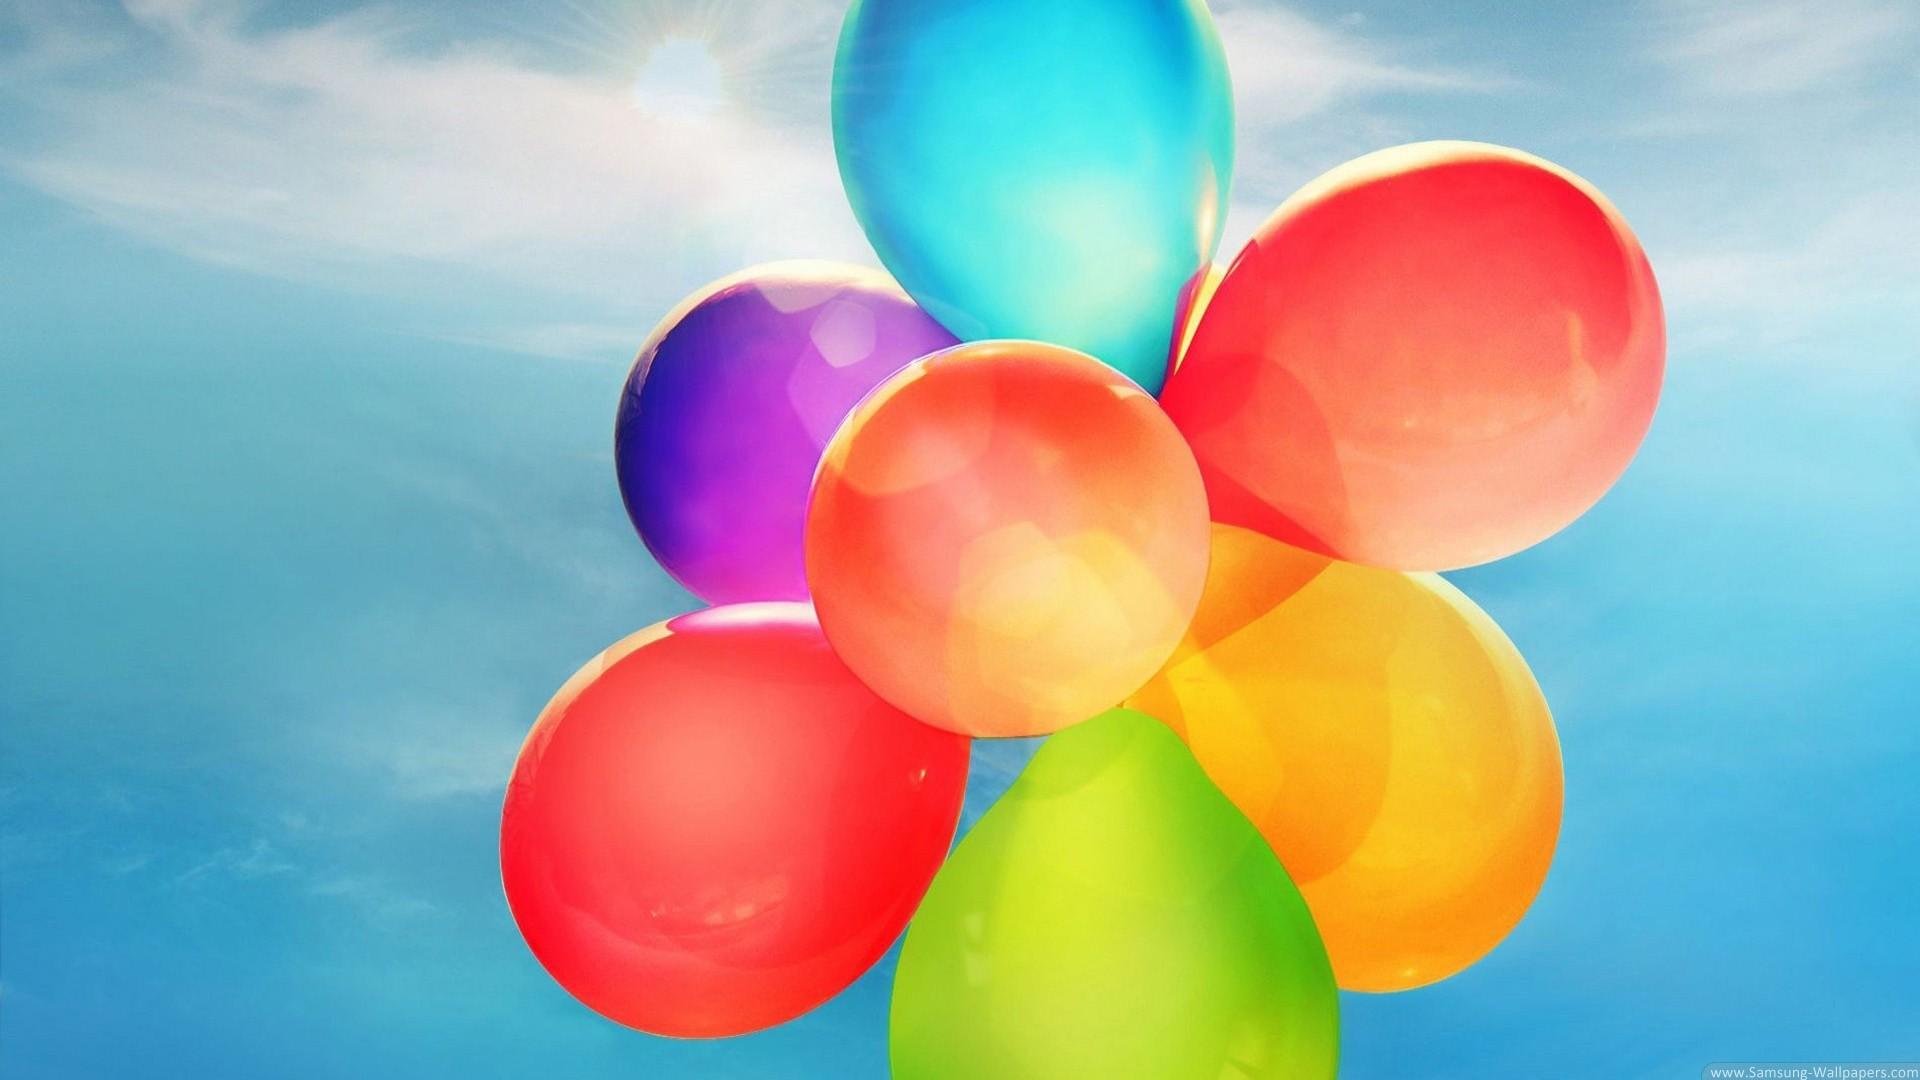 Balloon Download Wallpaper